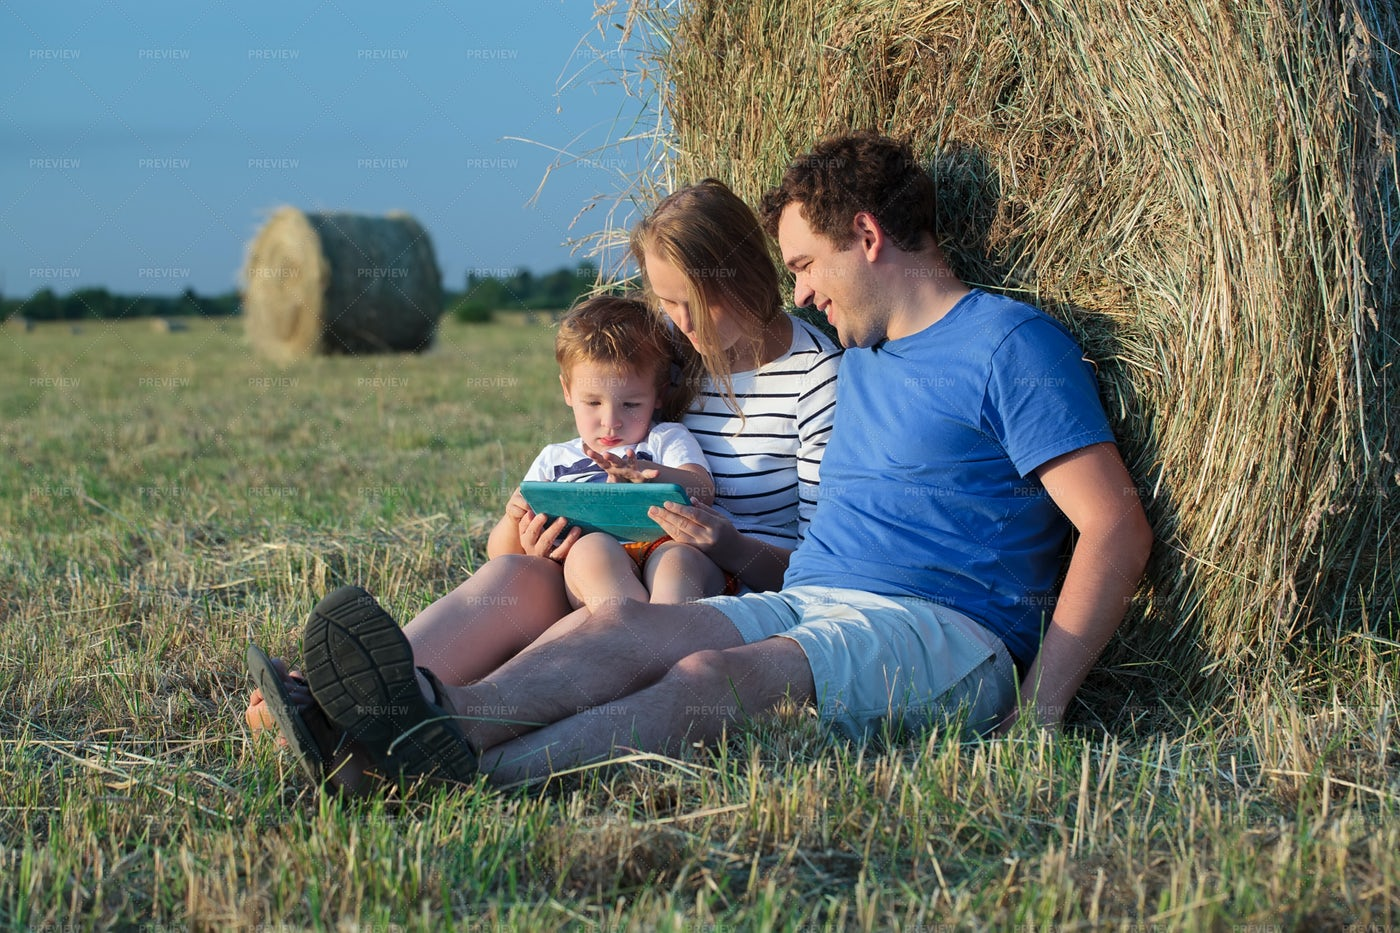 Family On Field With Ipad: Stock Photos